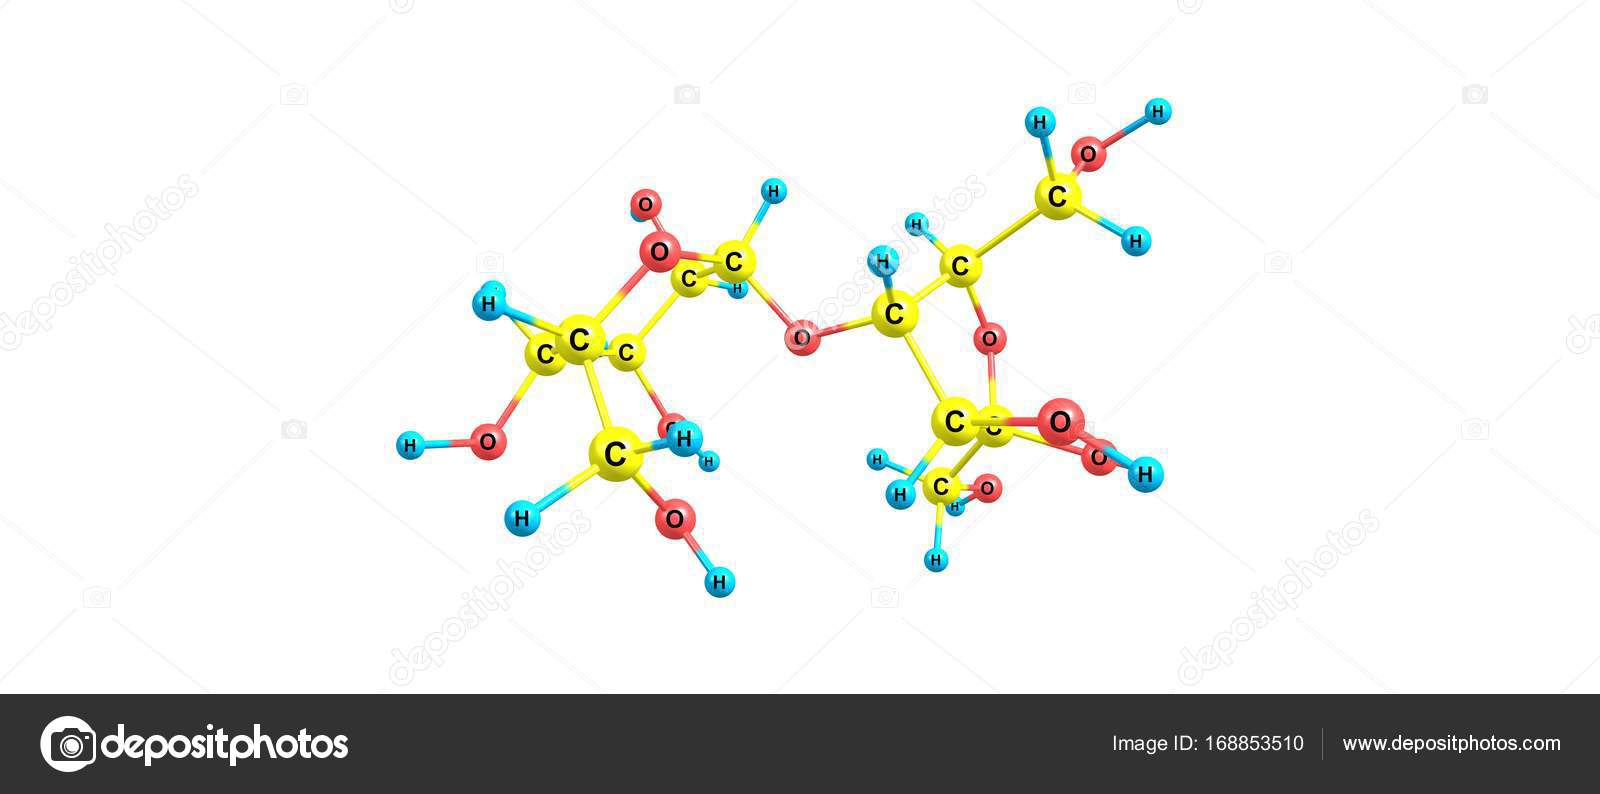 Formula Empirica De La Lactosa Estructura Molecular De La